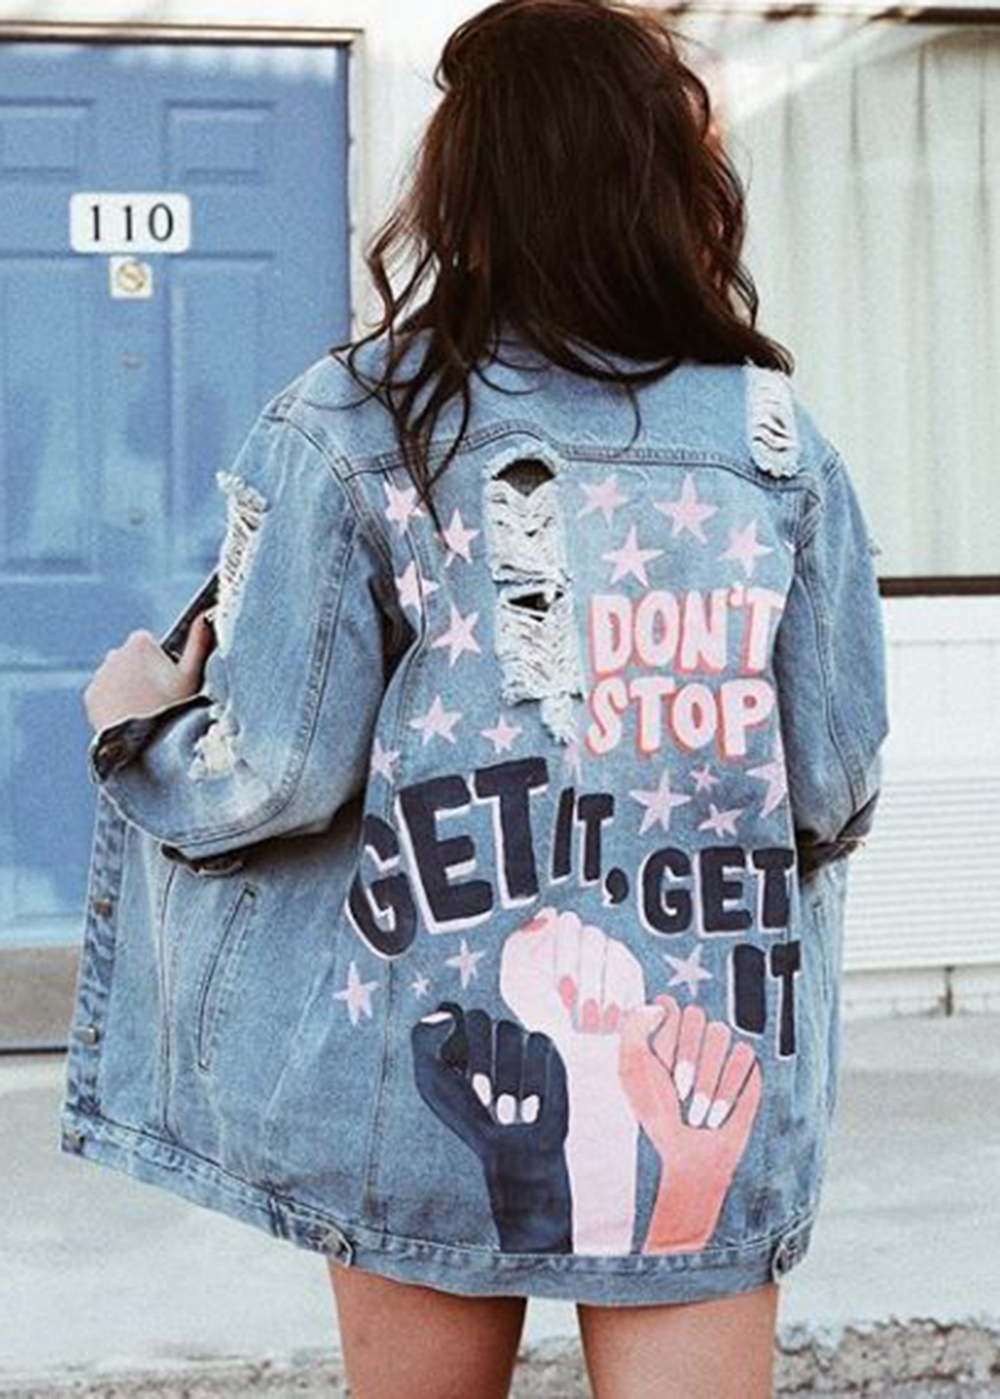 Blue Denim Painted Jean Jackets #denimjacket #diyclothes #paintedclothes  #denimdiy #diyfashion #diydenimjacket #denimart  #artclothes #painteddenimjacket #jeanjacket